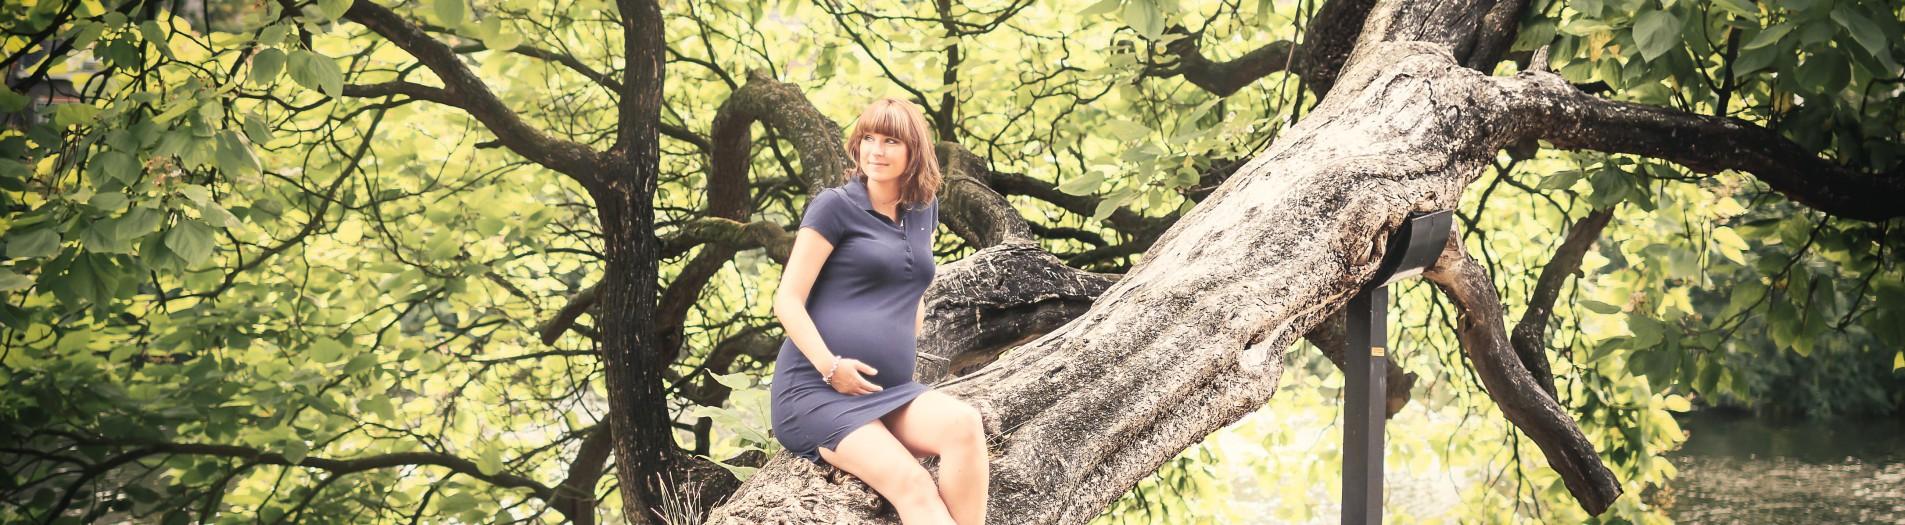 zwangerschapsfotografie, Breda